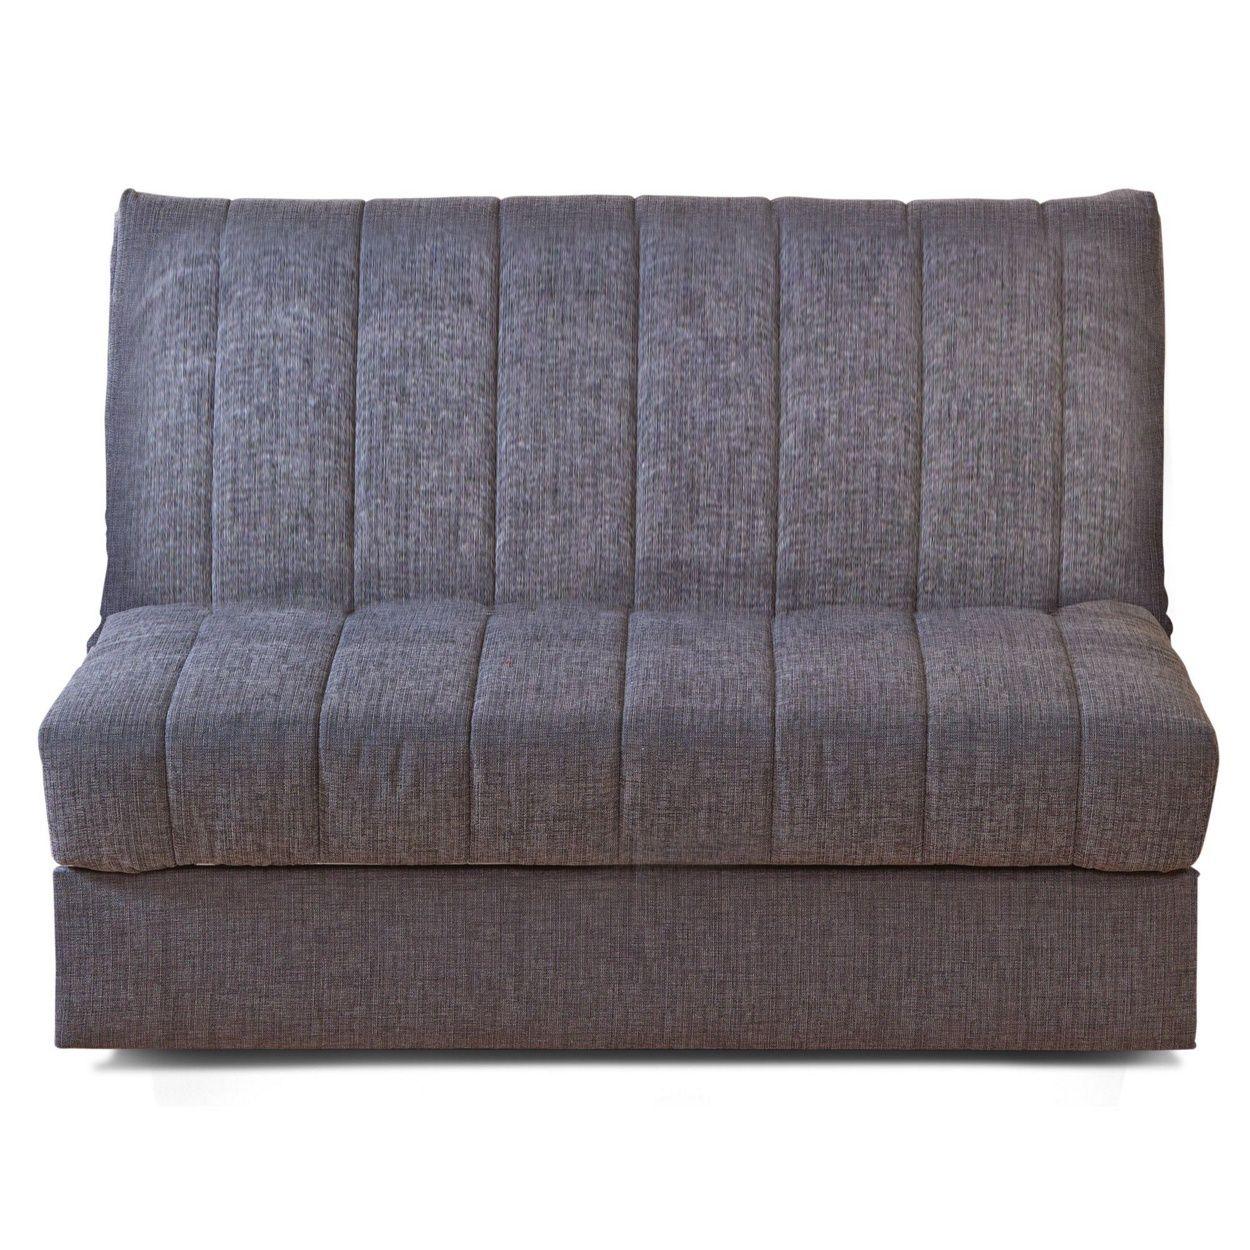 Debenhams \'Lindale\' sofa bed- at Debenhams.com | Office | Pinterest